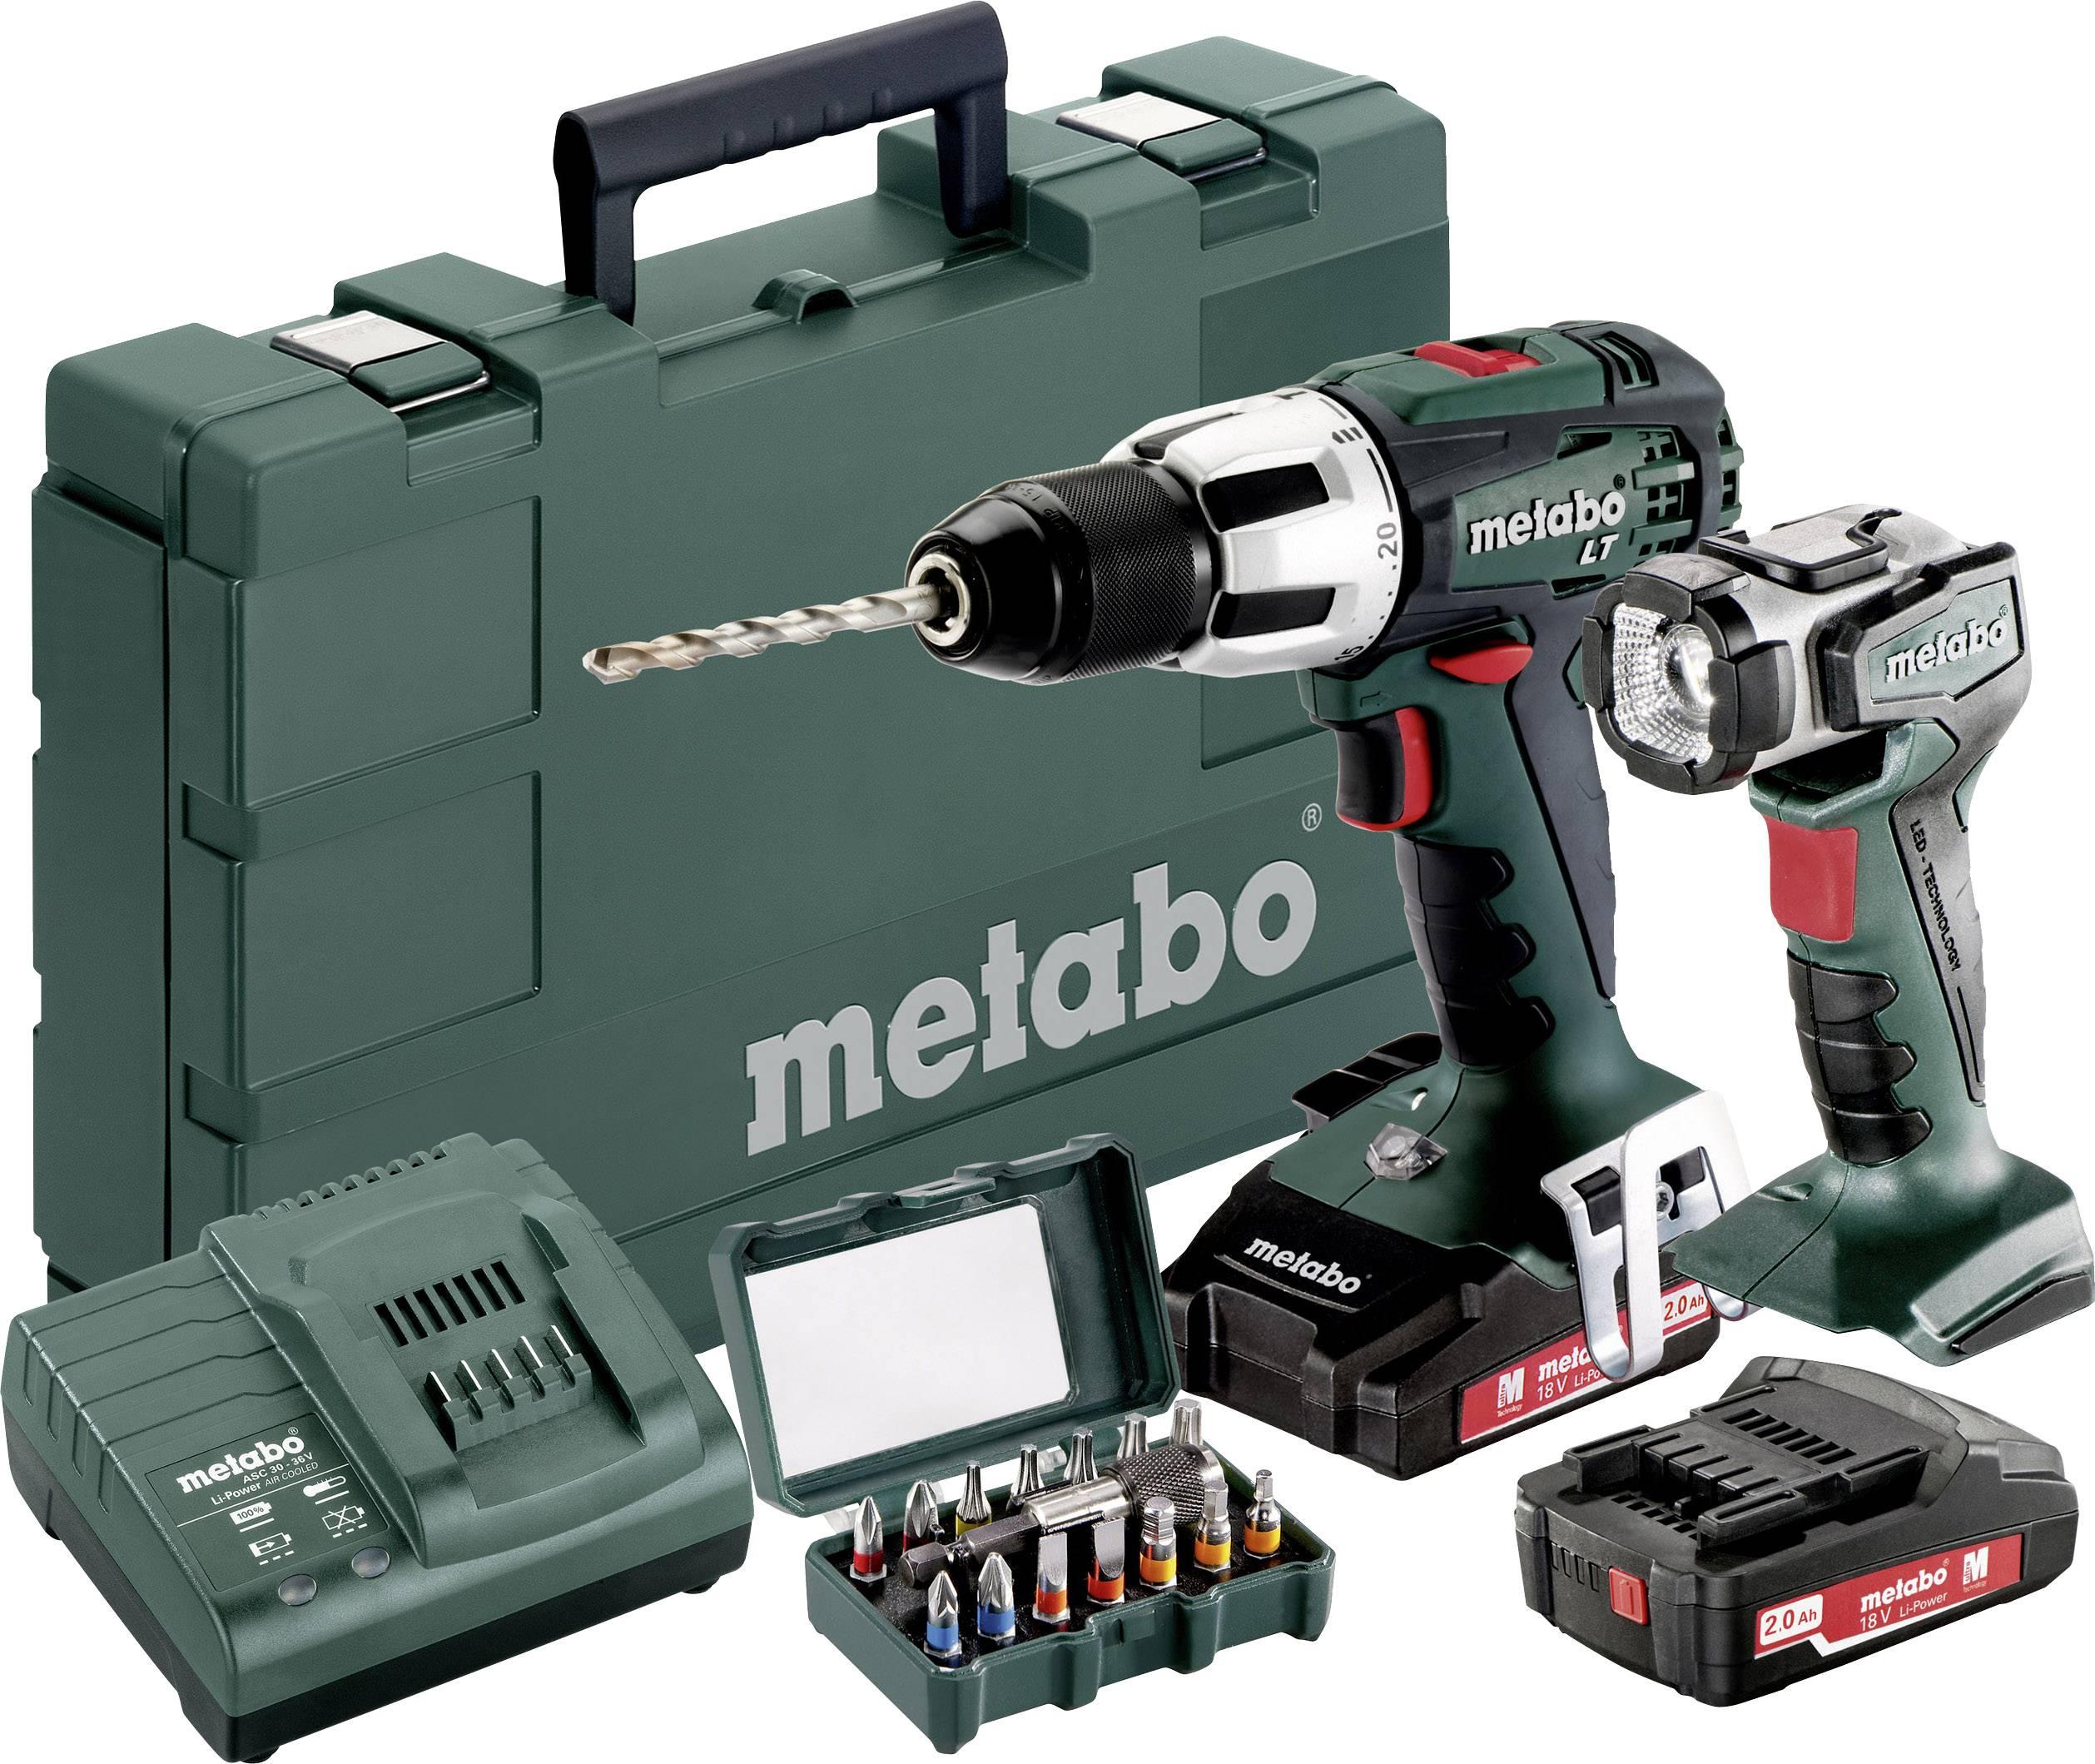 Aku příklepová vrtačka Metabo SB 18 LT 602103610, 18 V, 2 Ah, Li-Ion akumulátor